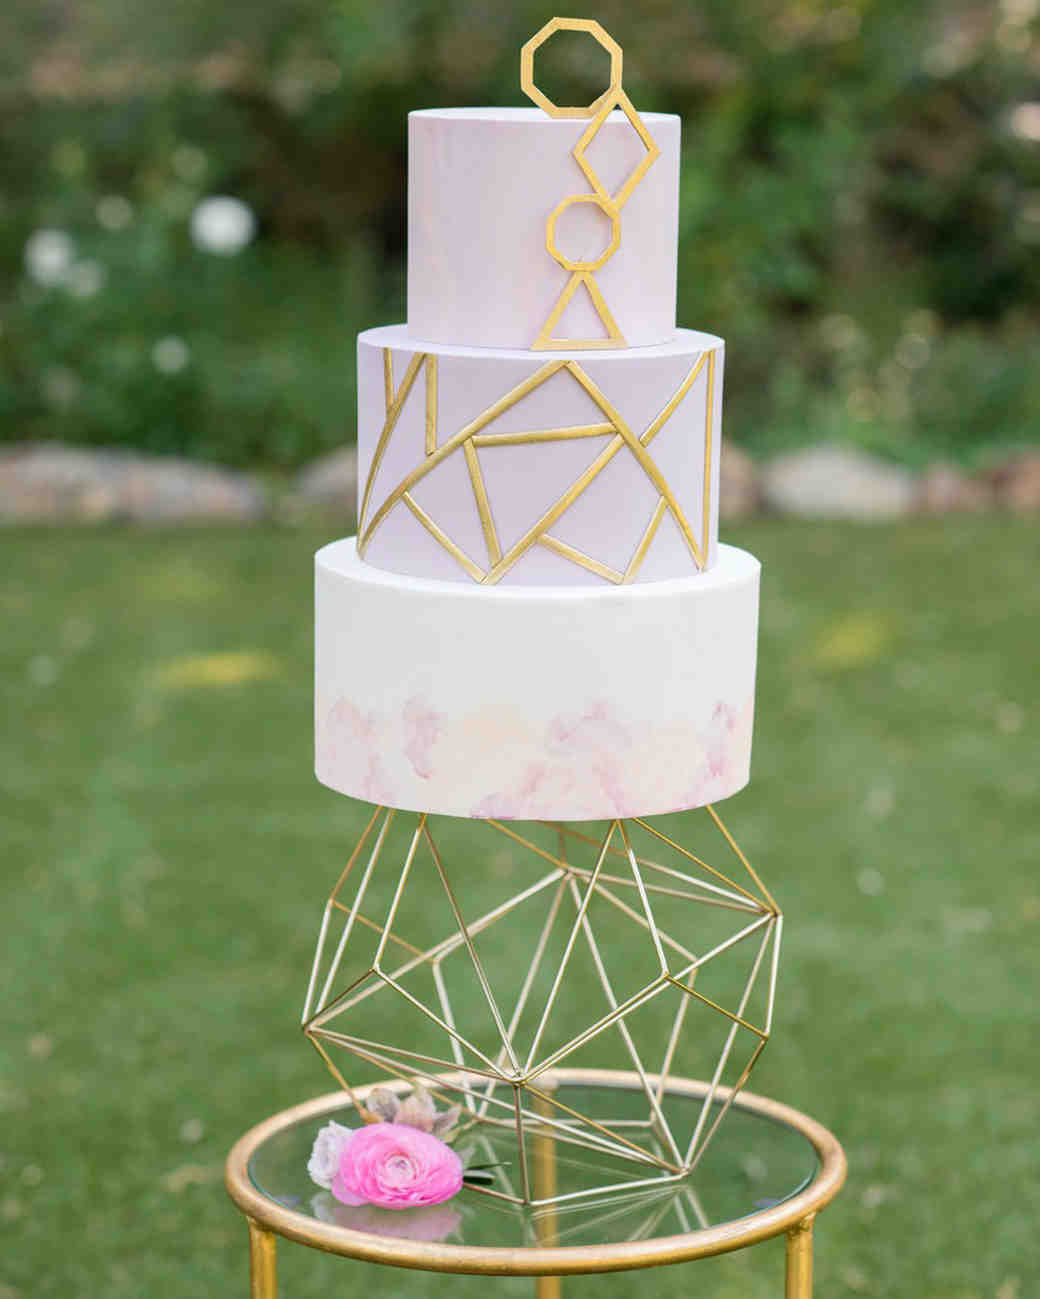 25 wedding cake design ideas thatll wow your guests martha 25 wedding cake design ideas thatll wow your guests martha stewart weddings junglespirit Choice Image